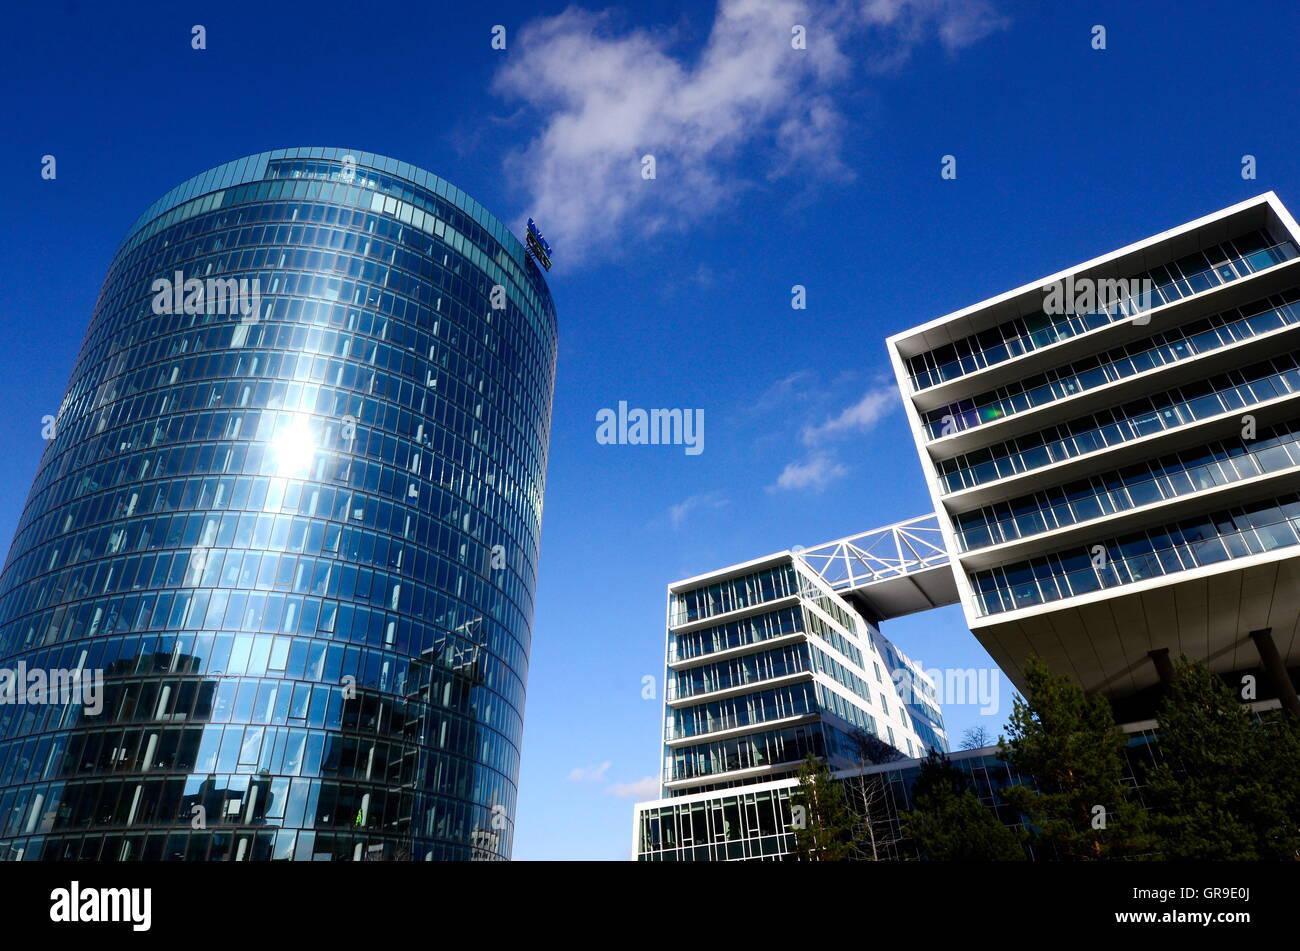 Omv Headquarters In Vienna, Austria Stock Photo: 117607858